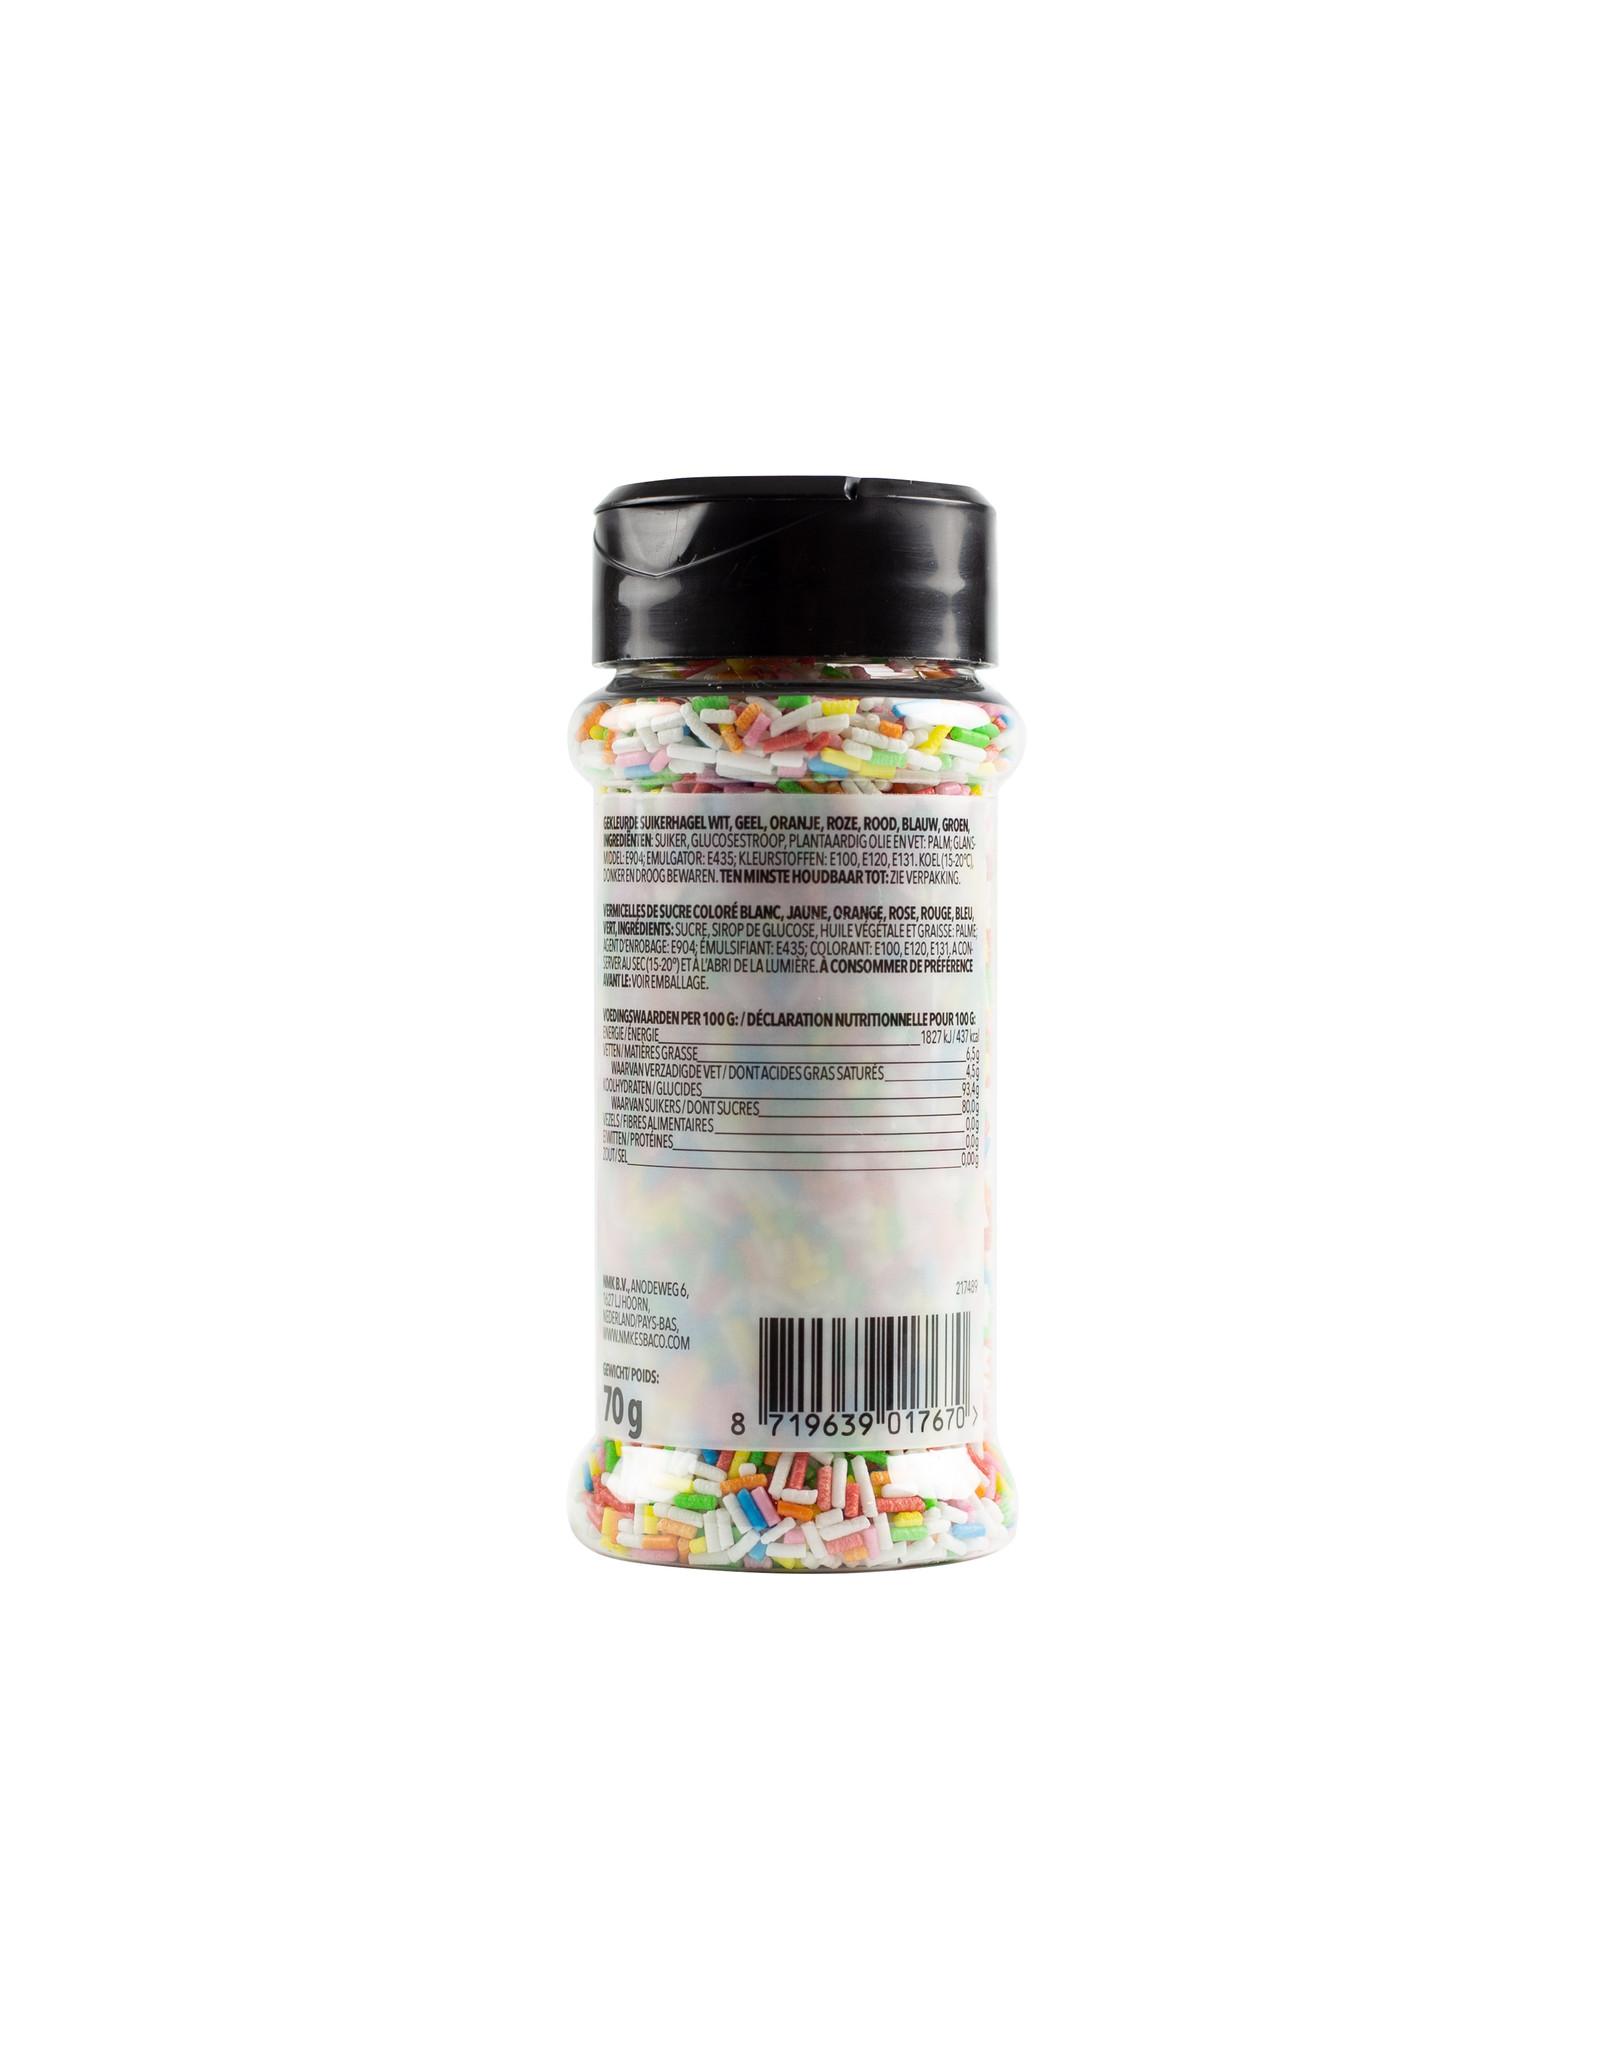 VOILA Home Bakery Voila Home Bakery Multi Coloured Sugar Strands rainbow  - 70 grams sprinkle jar